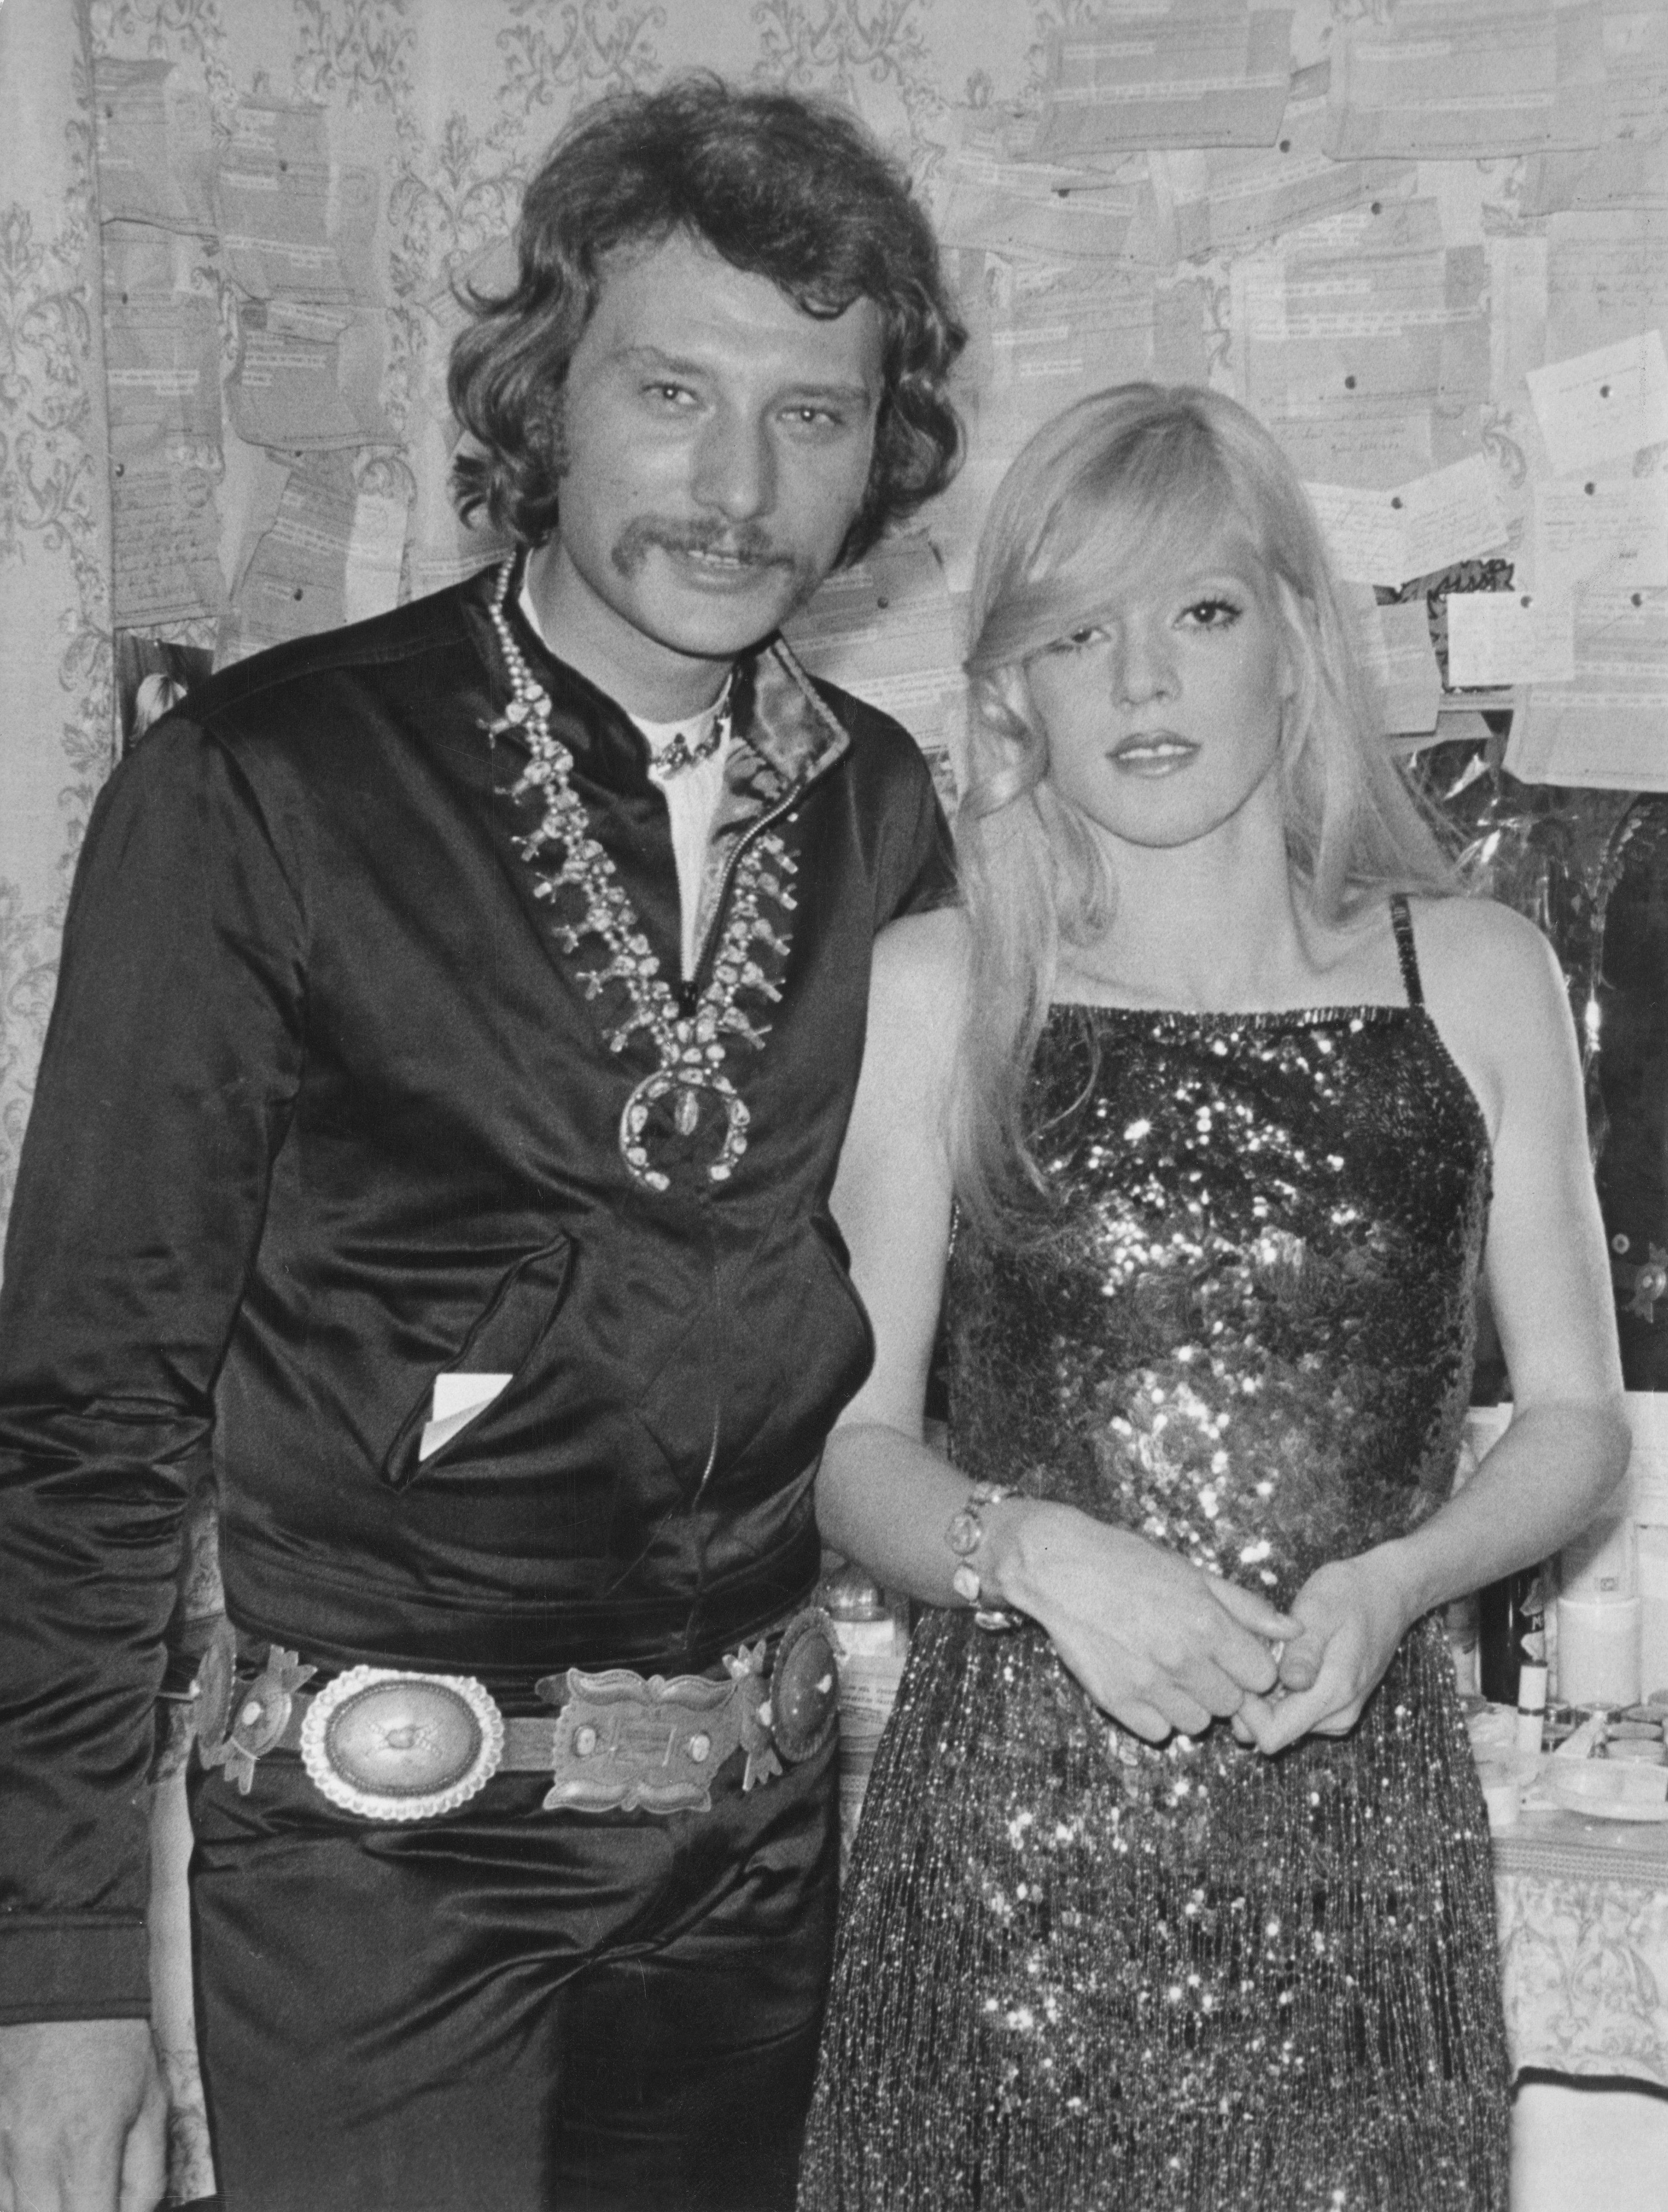 Johnny Hallyday et Sylvie Vartan en couple l Source: Getty Images